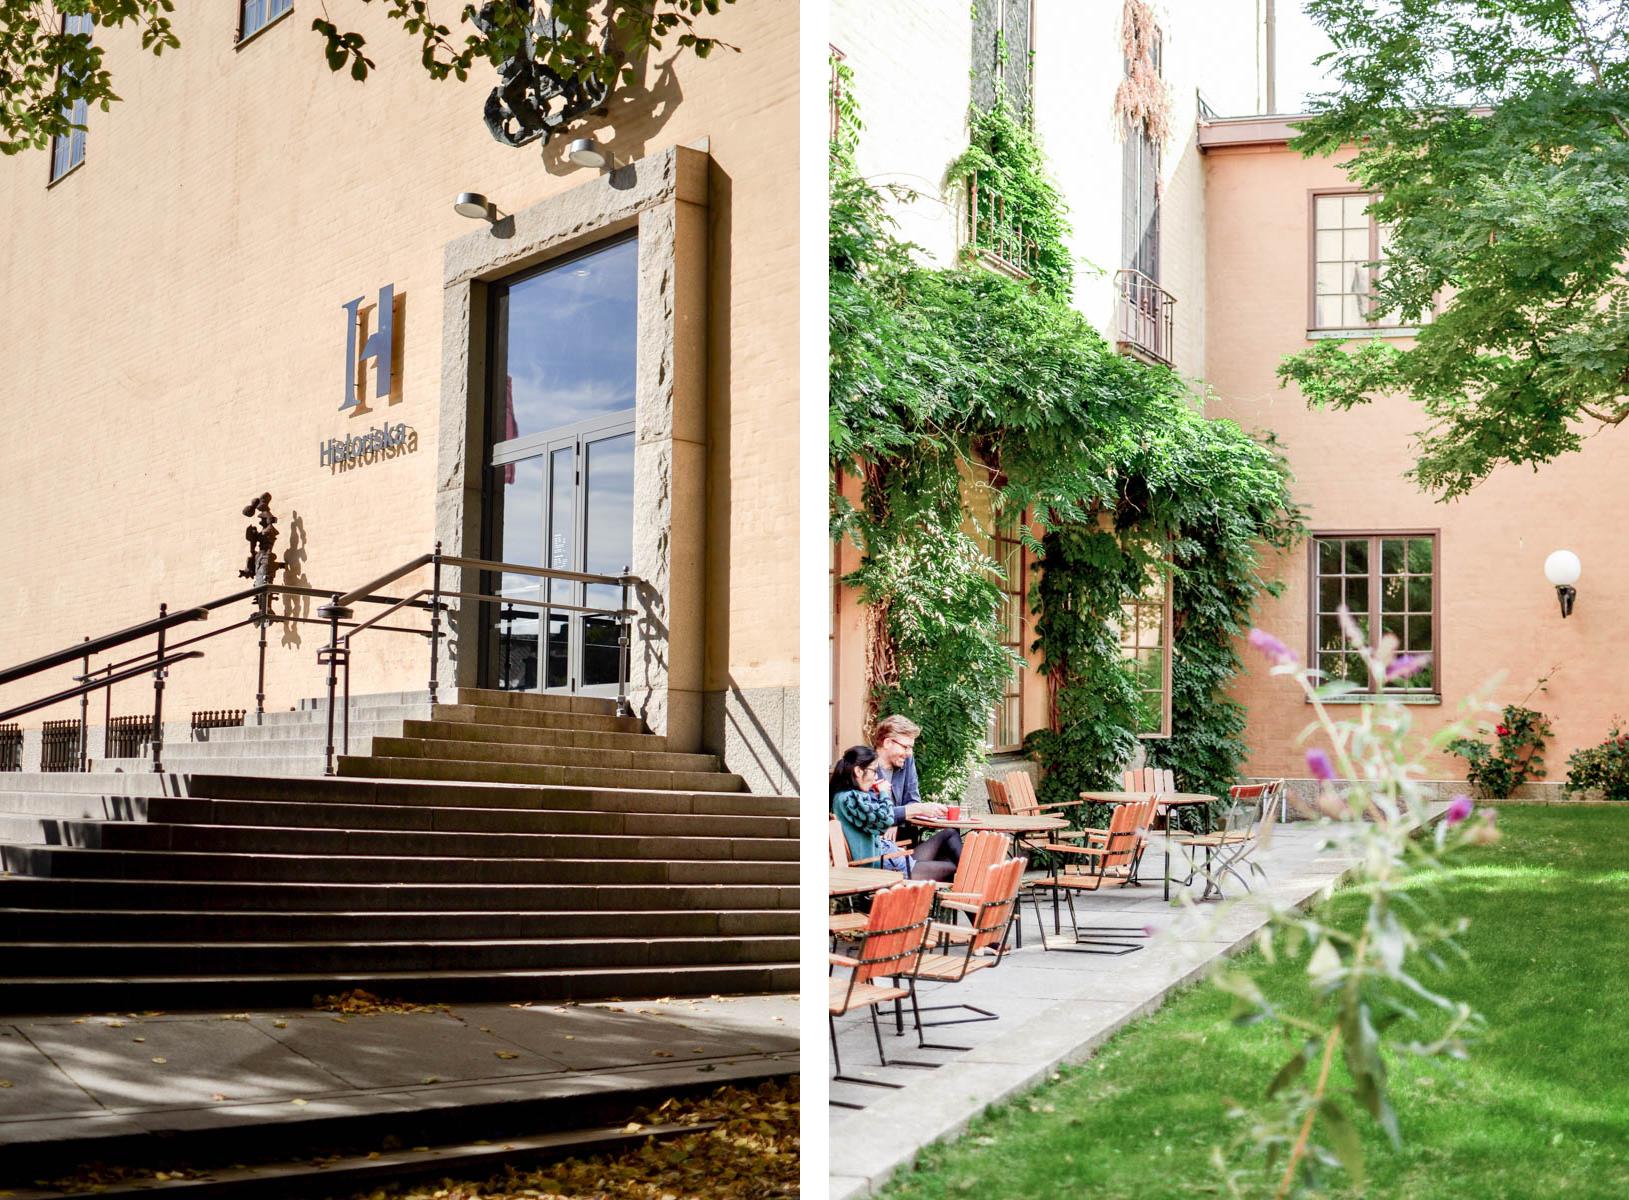 10-tourism-stockholm-historiska-1-i-scandinavia-standard